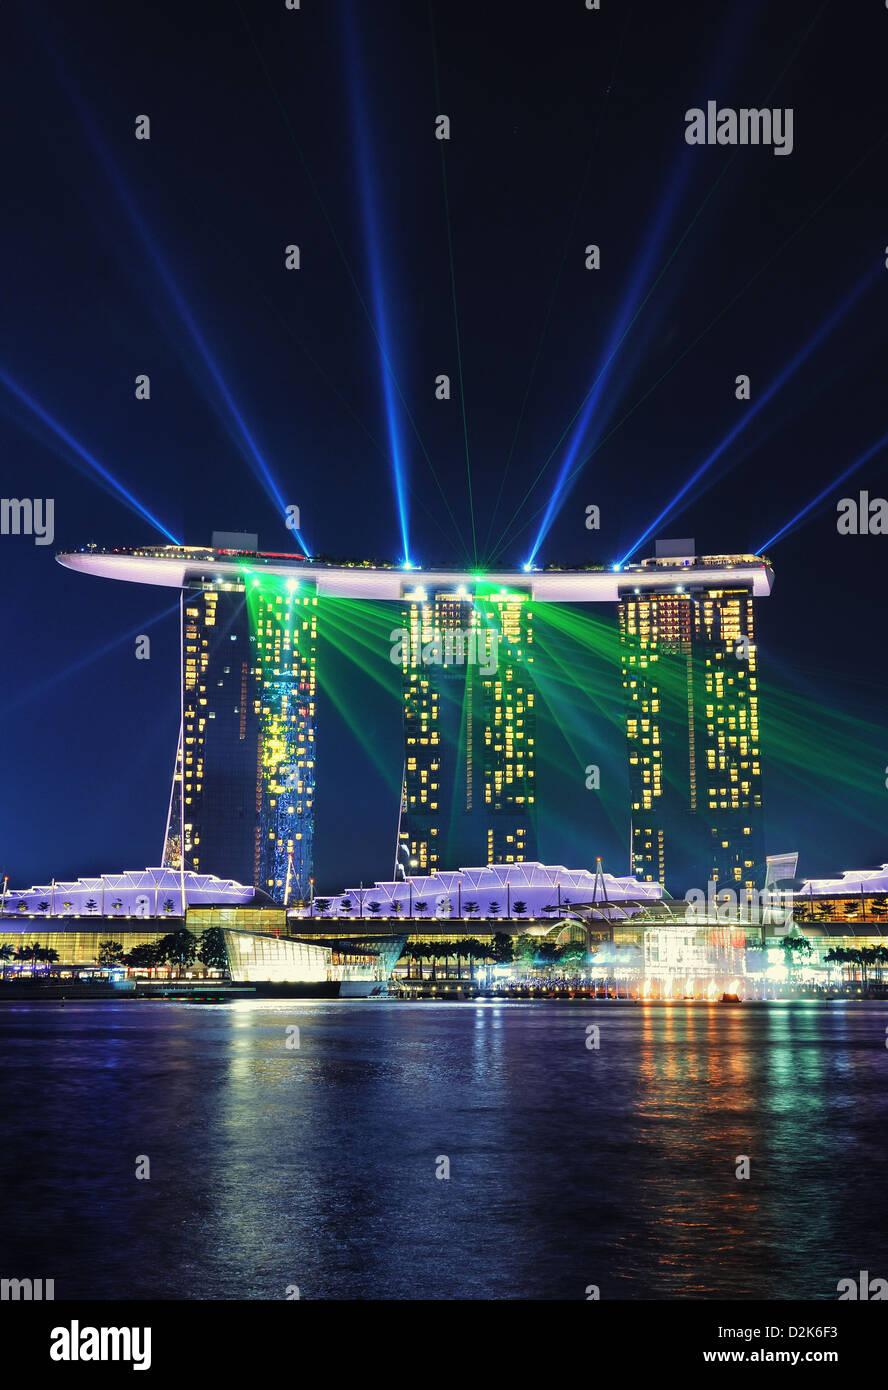 wonder full light show at marina bay sands hotel in singapore stock